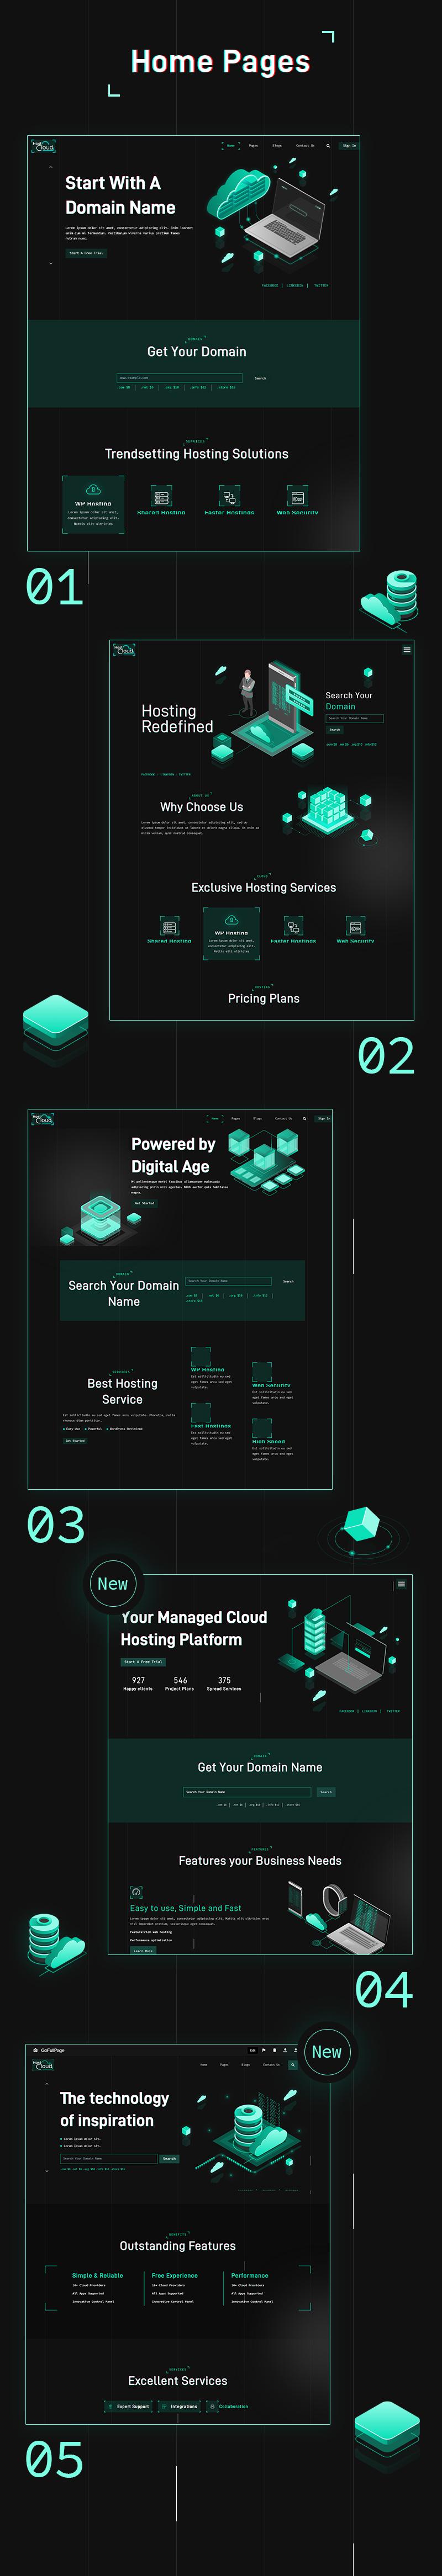 HostCloud   Hosting Server & Tech WordPress theme - 7